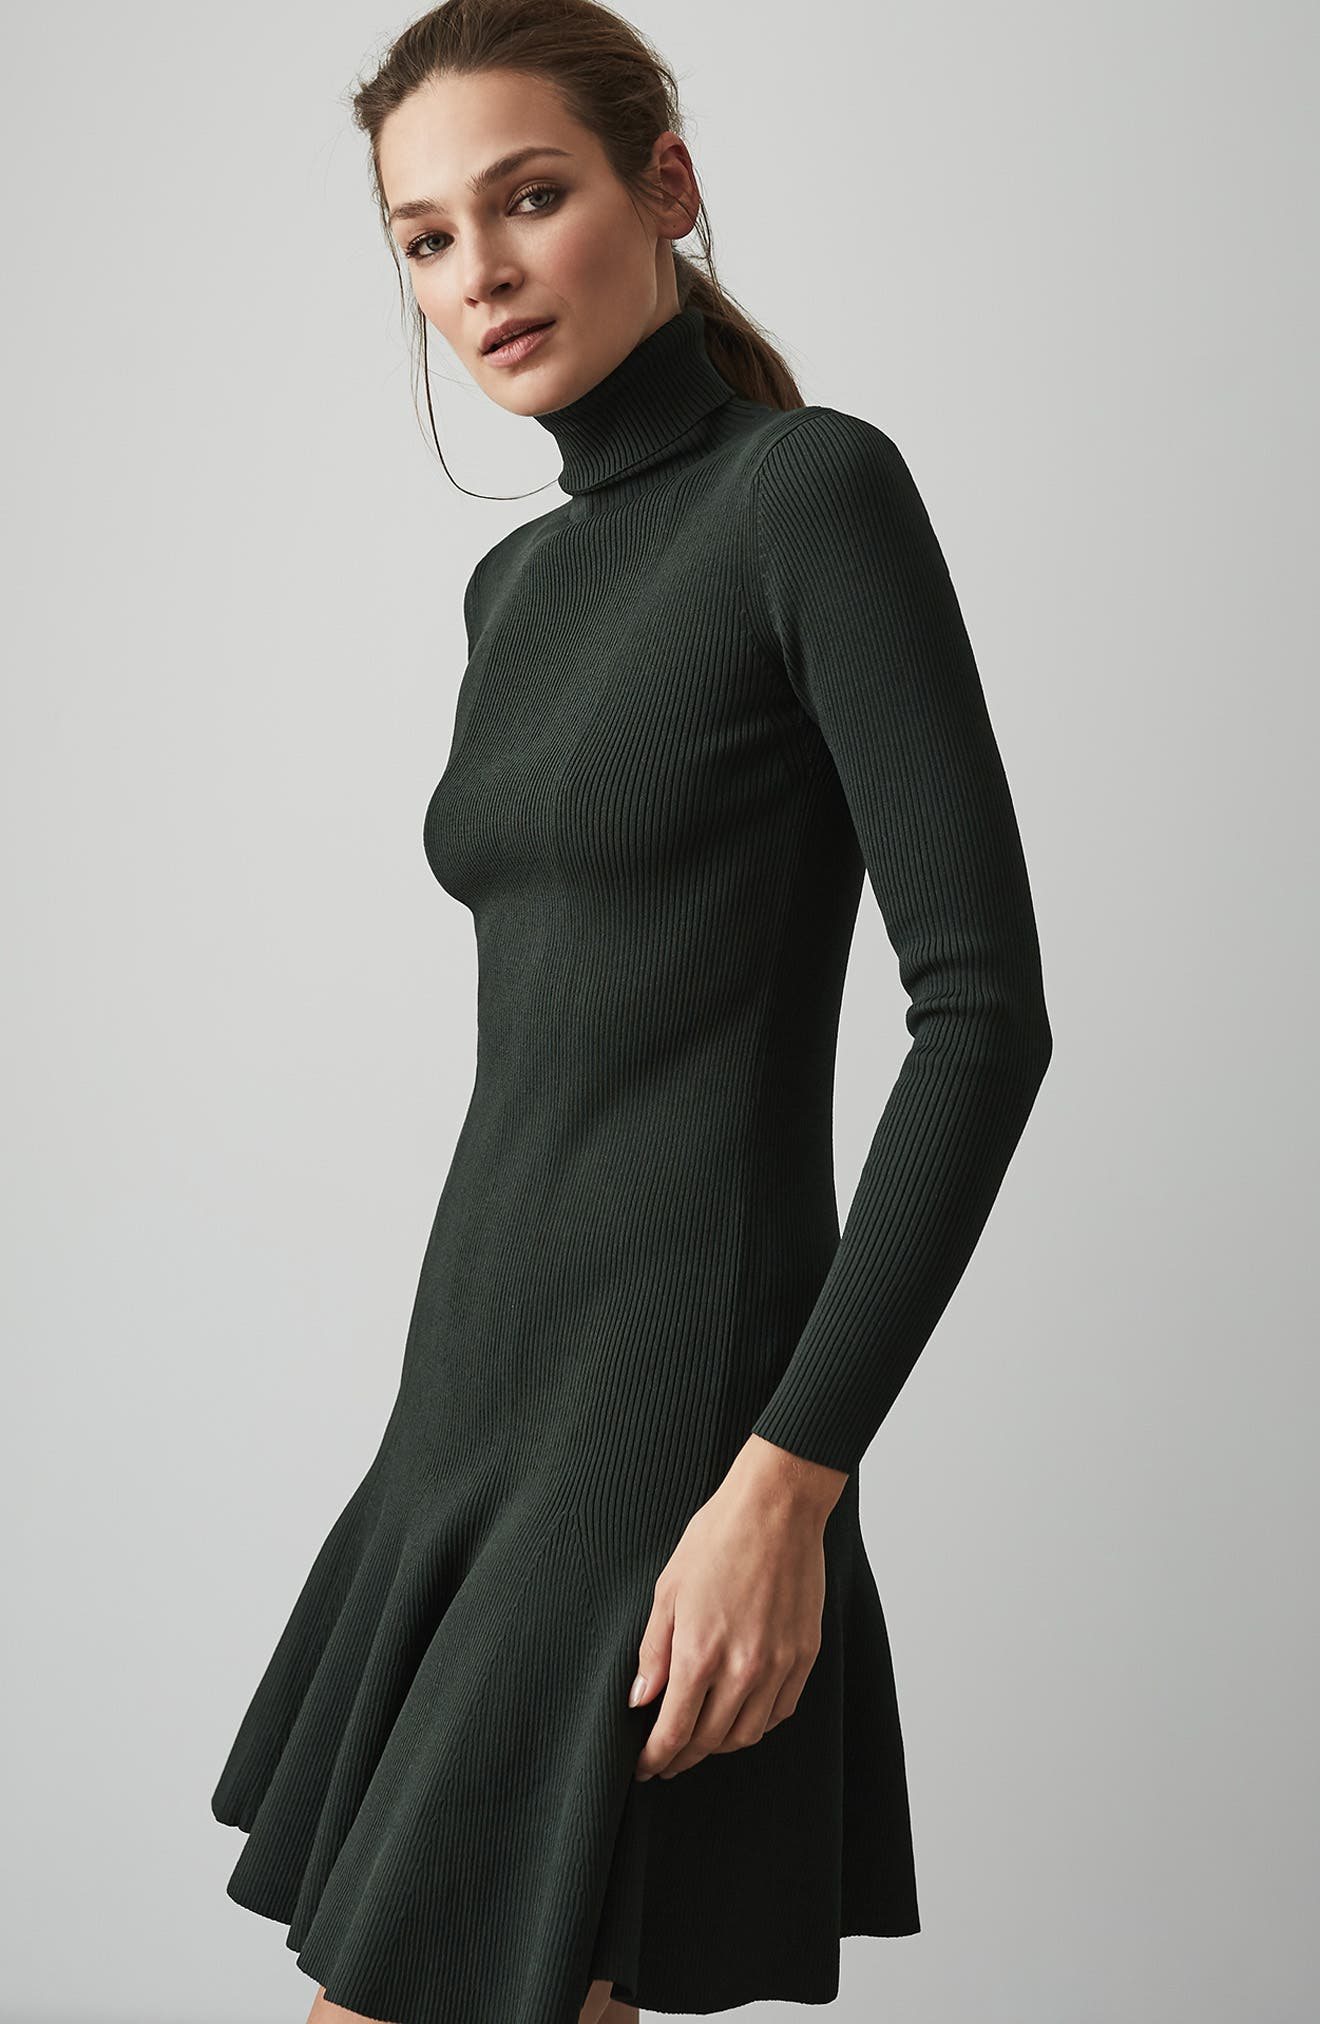 REISS,                             Mimi Turtleneck Sweater Dress,                             Alternate thumbnail 6, color,                             GREEN